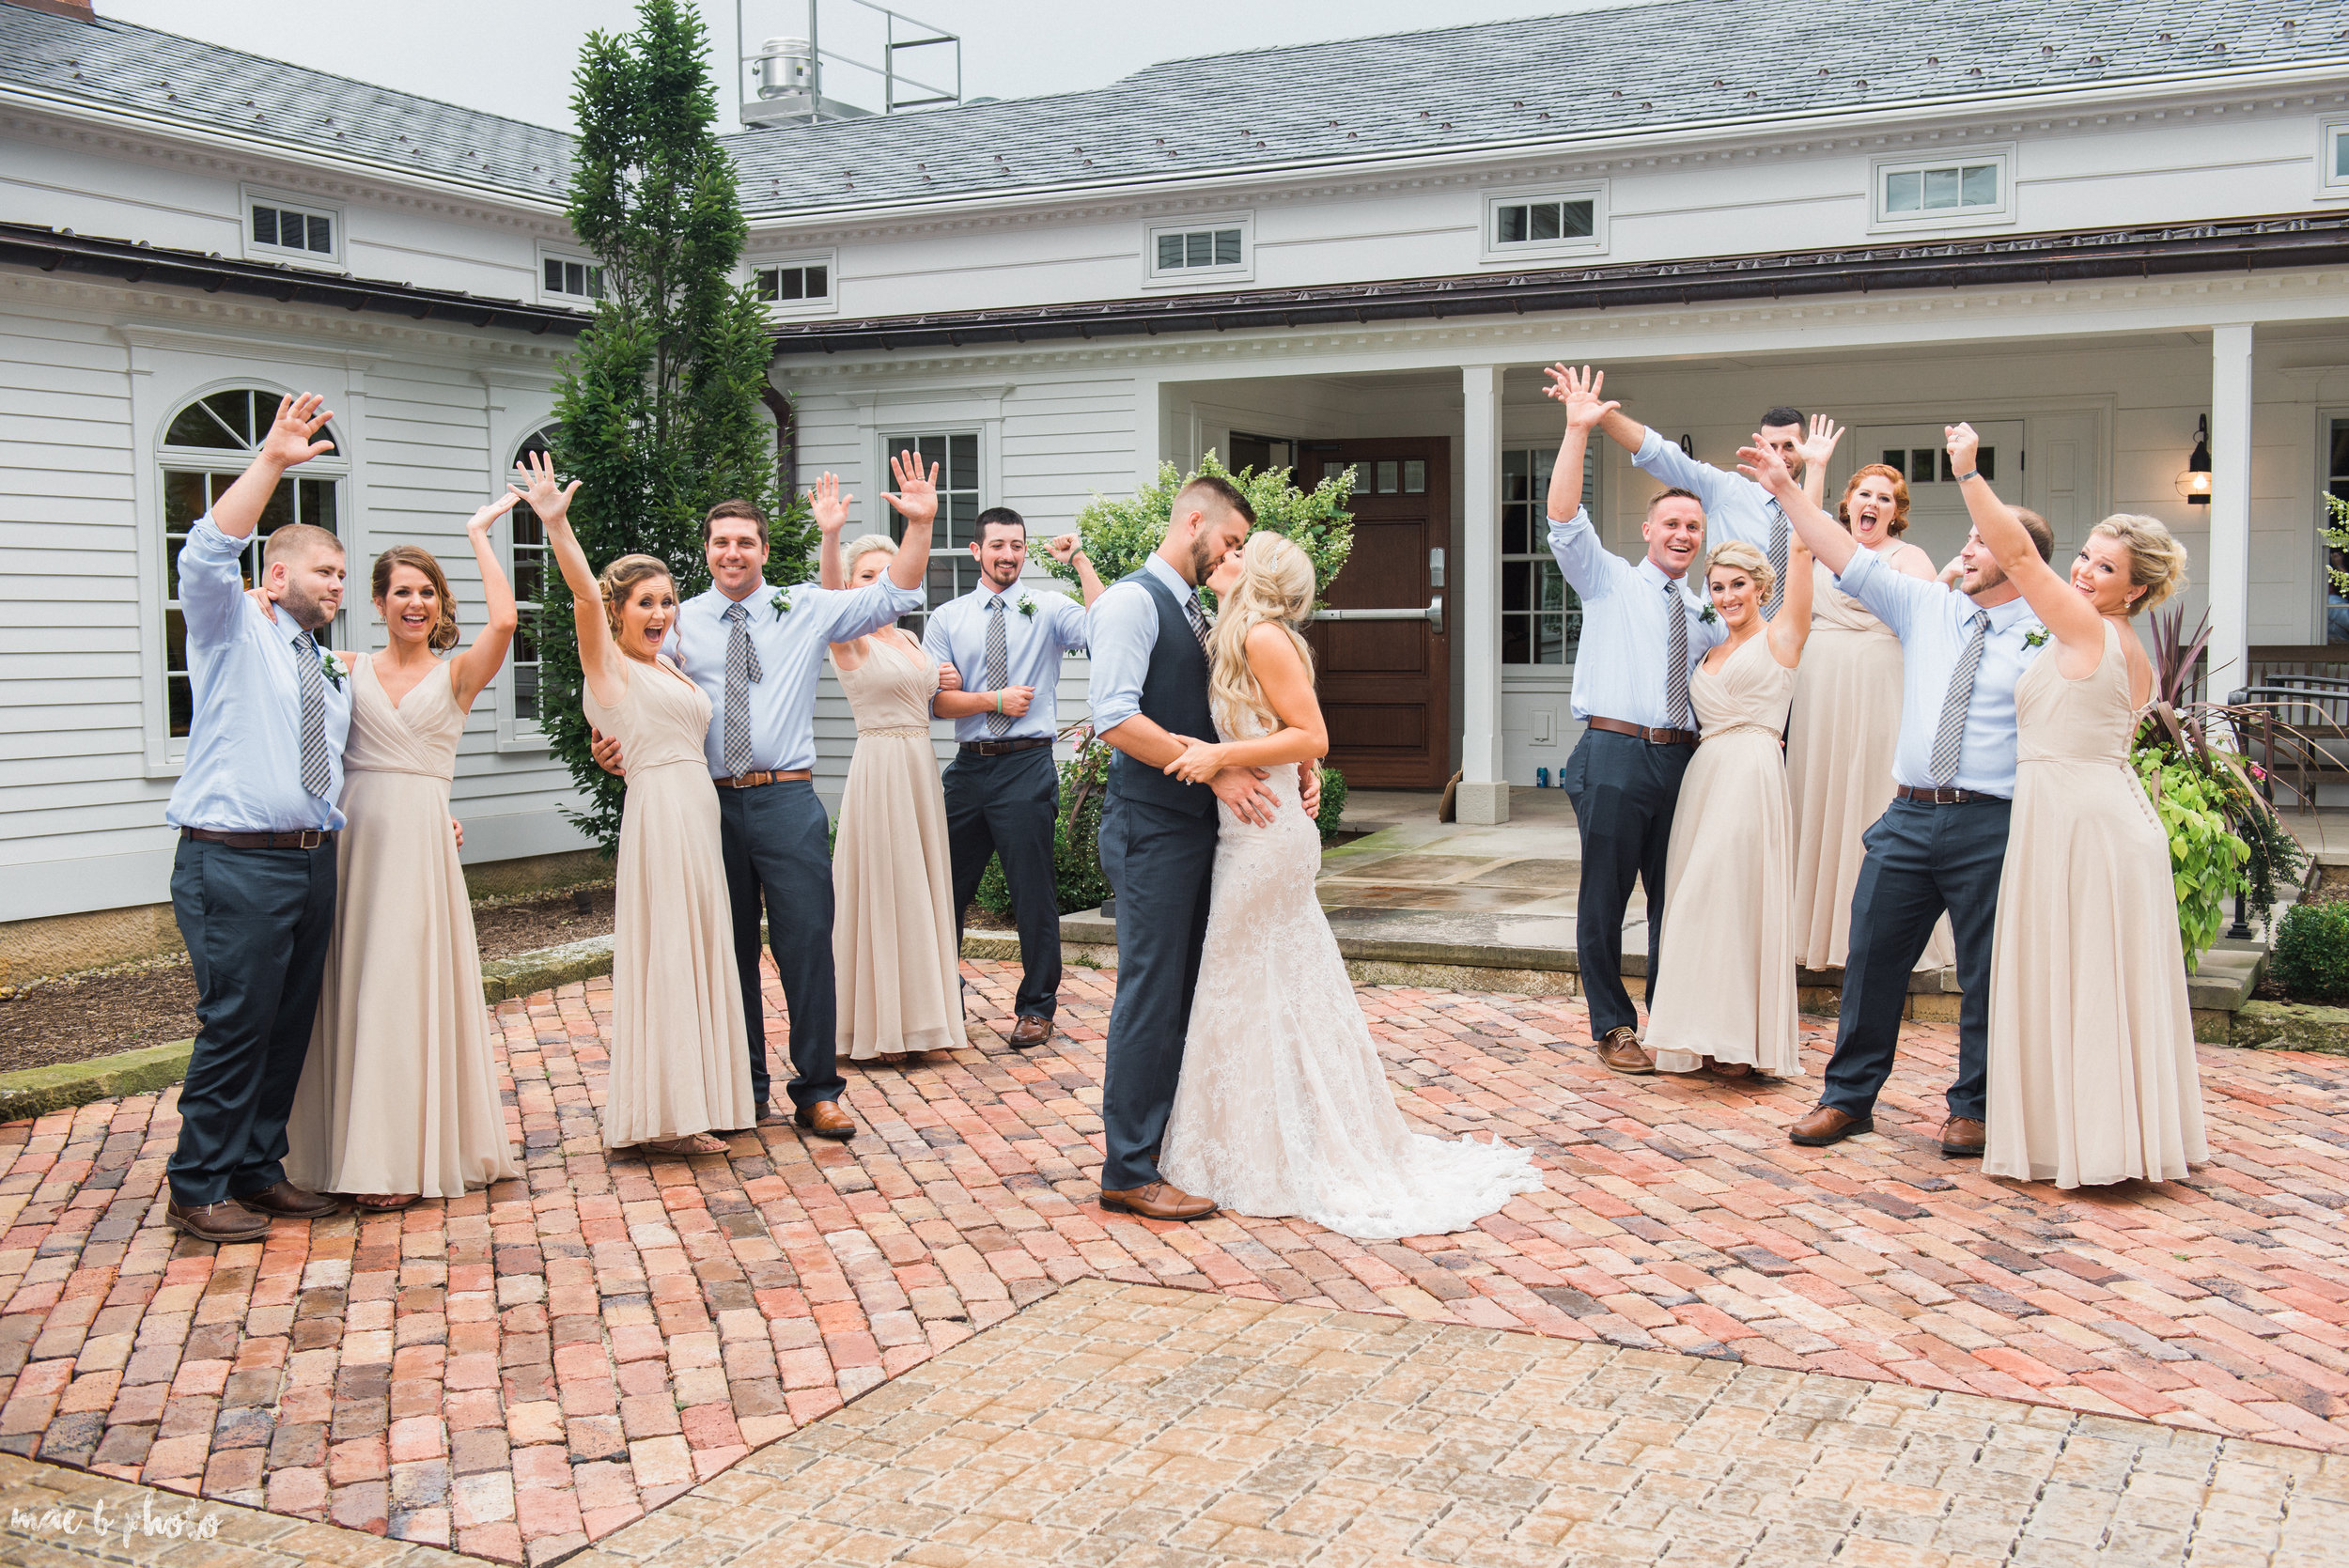 Tara & Matt's Elegant Backyard Summer Wedding in Kinsman, Ohio-60.jpg